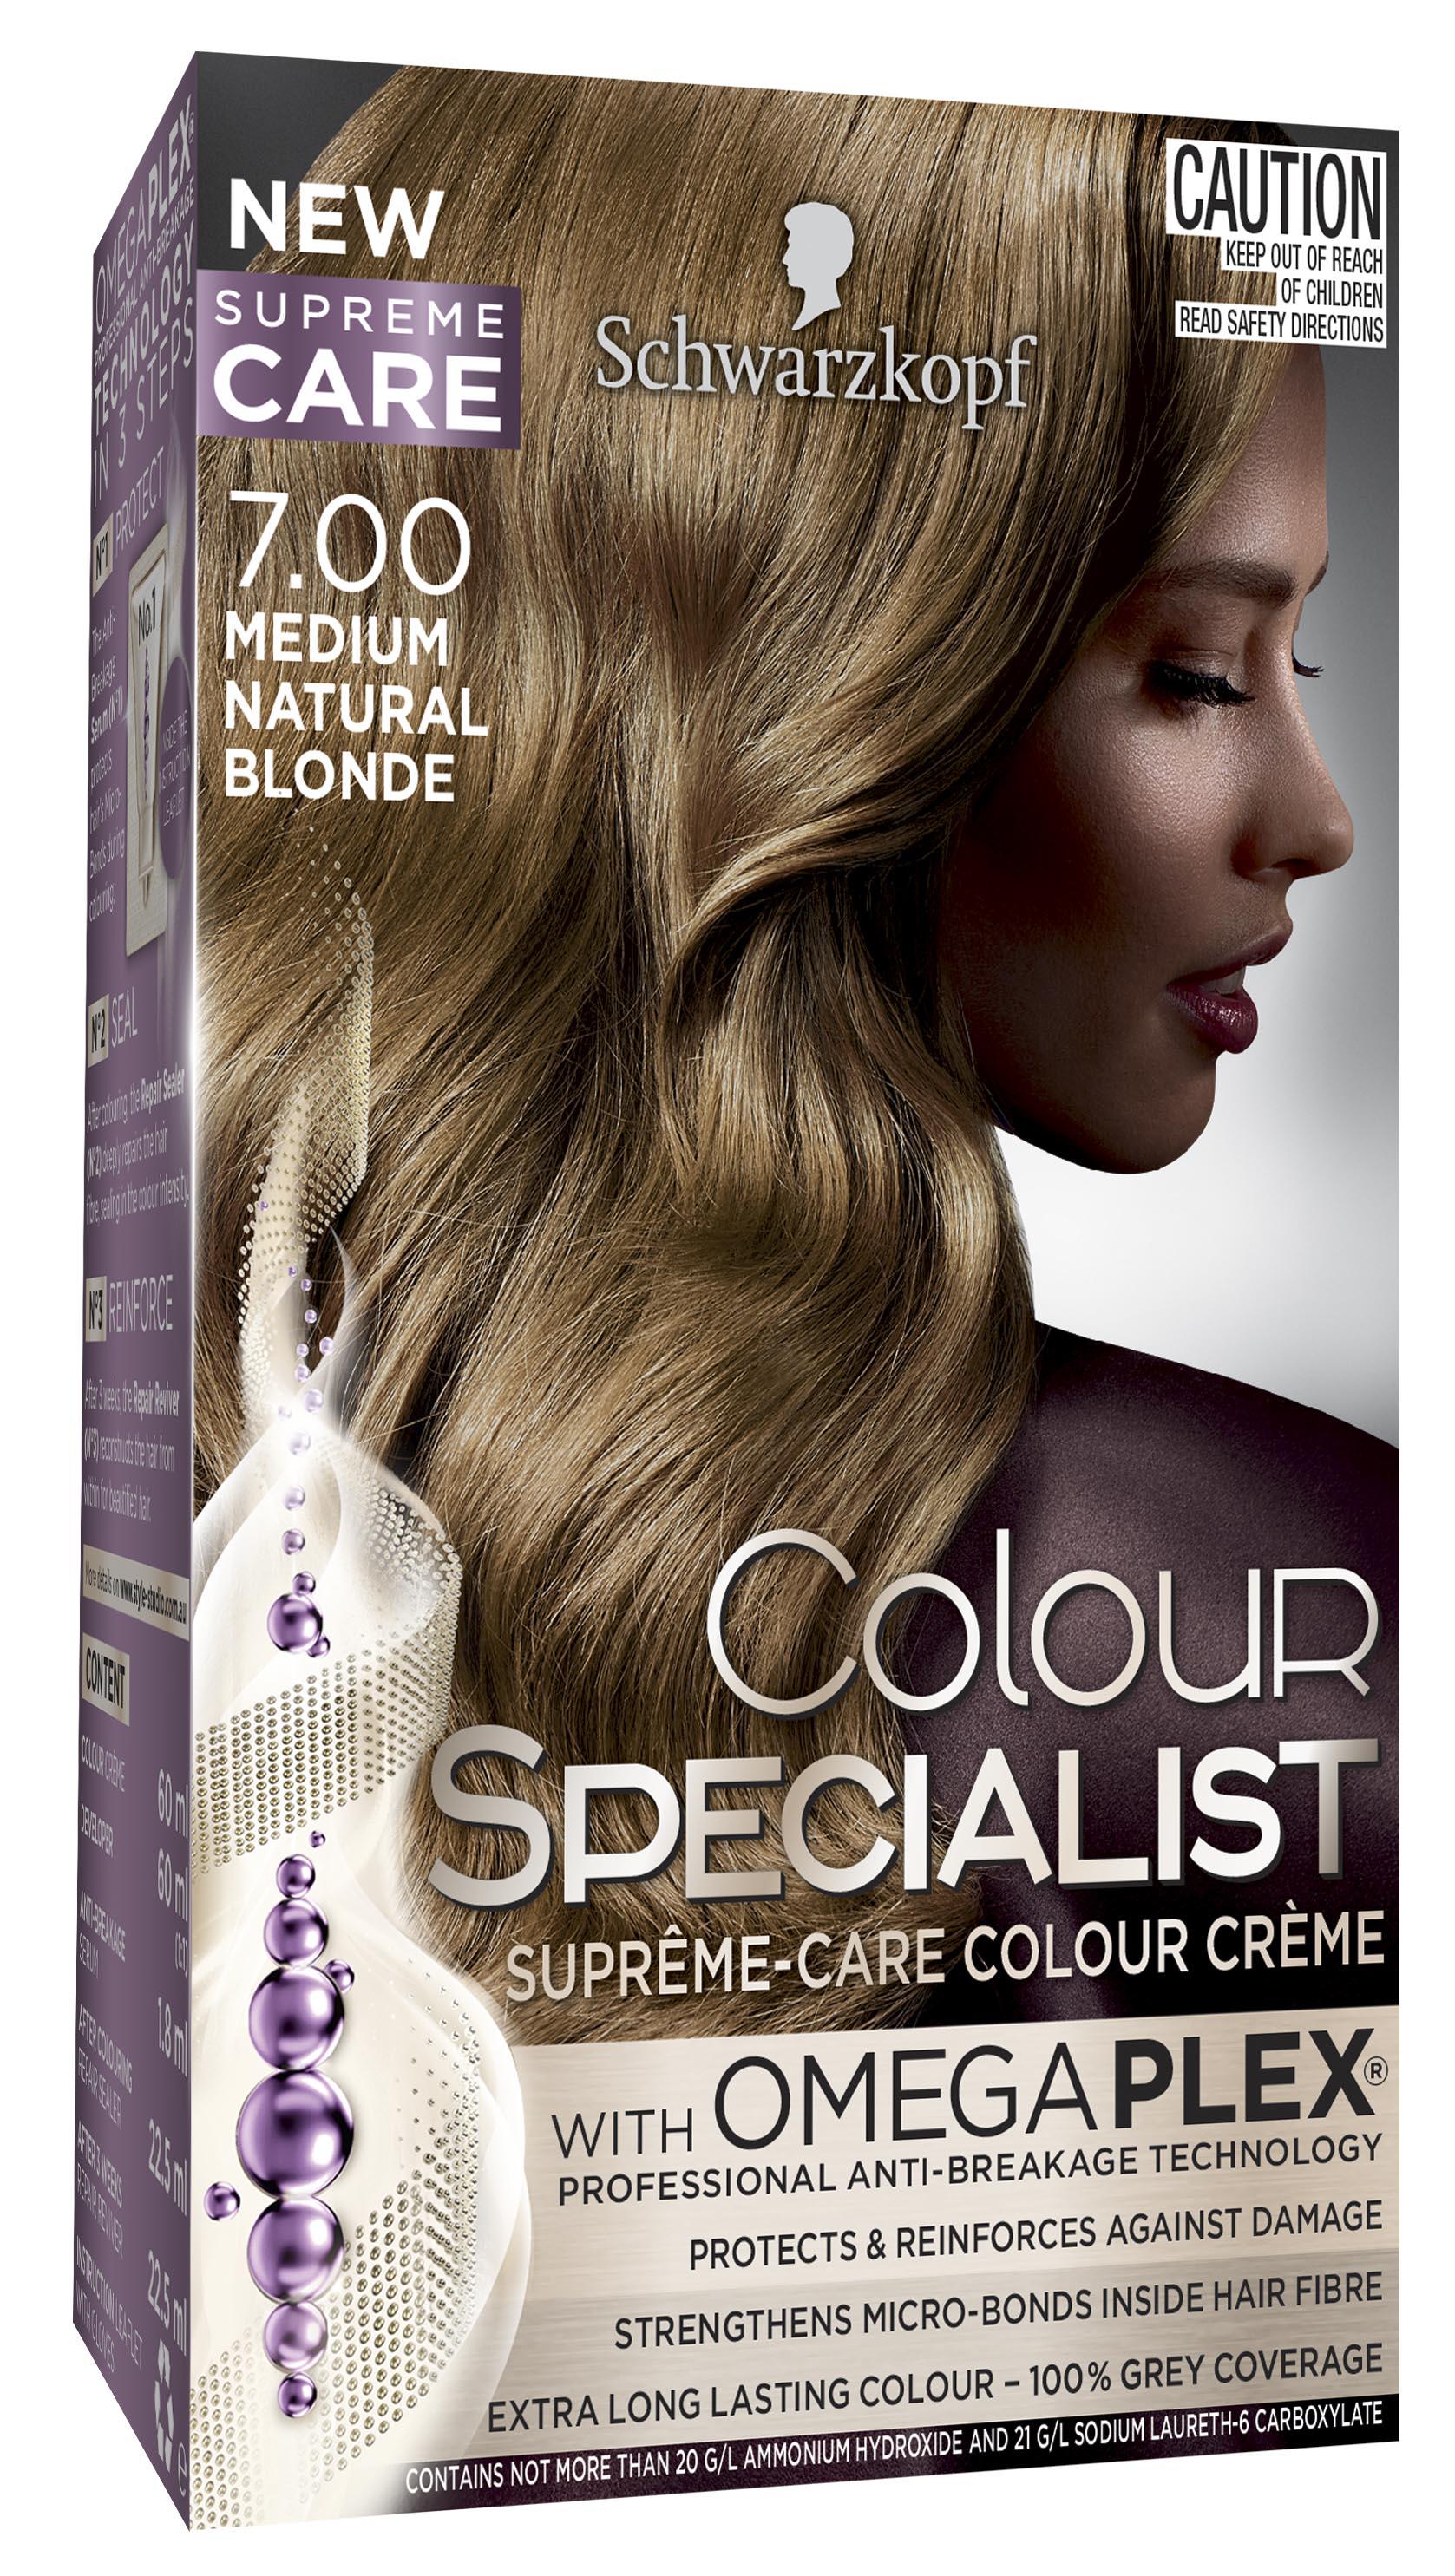 Colour Specialist 700 Medium Natural Blonde 3D LF-0040888